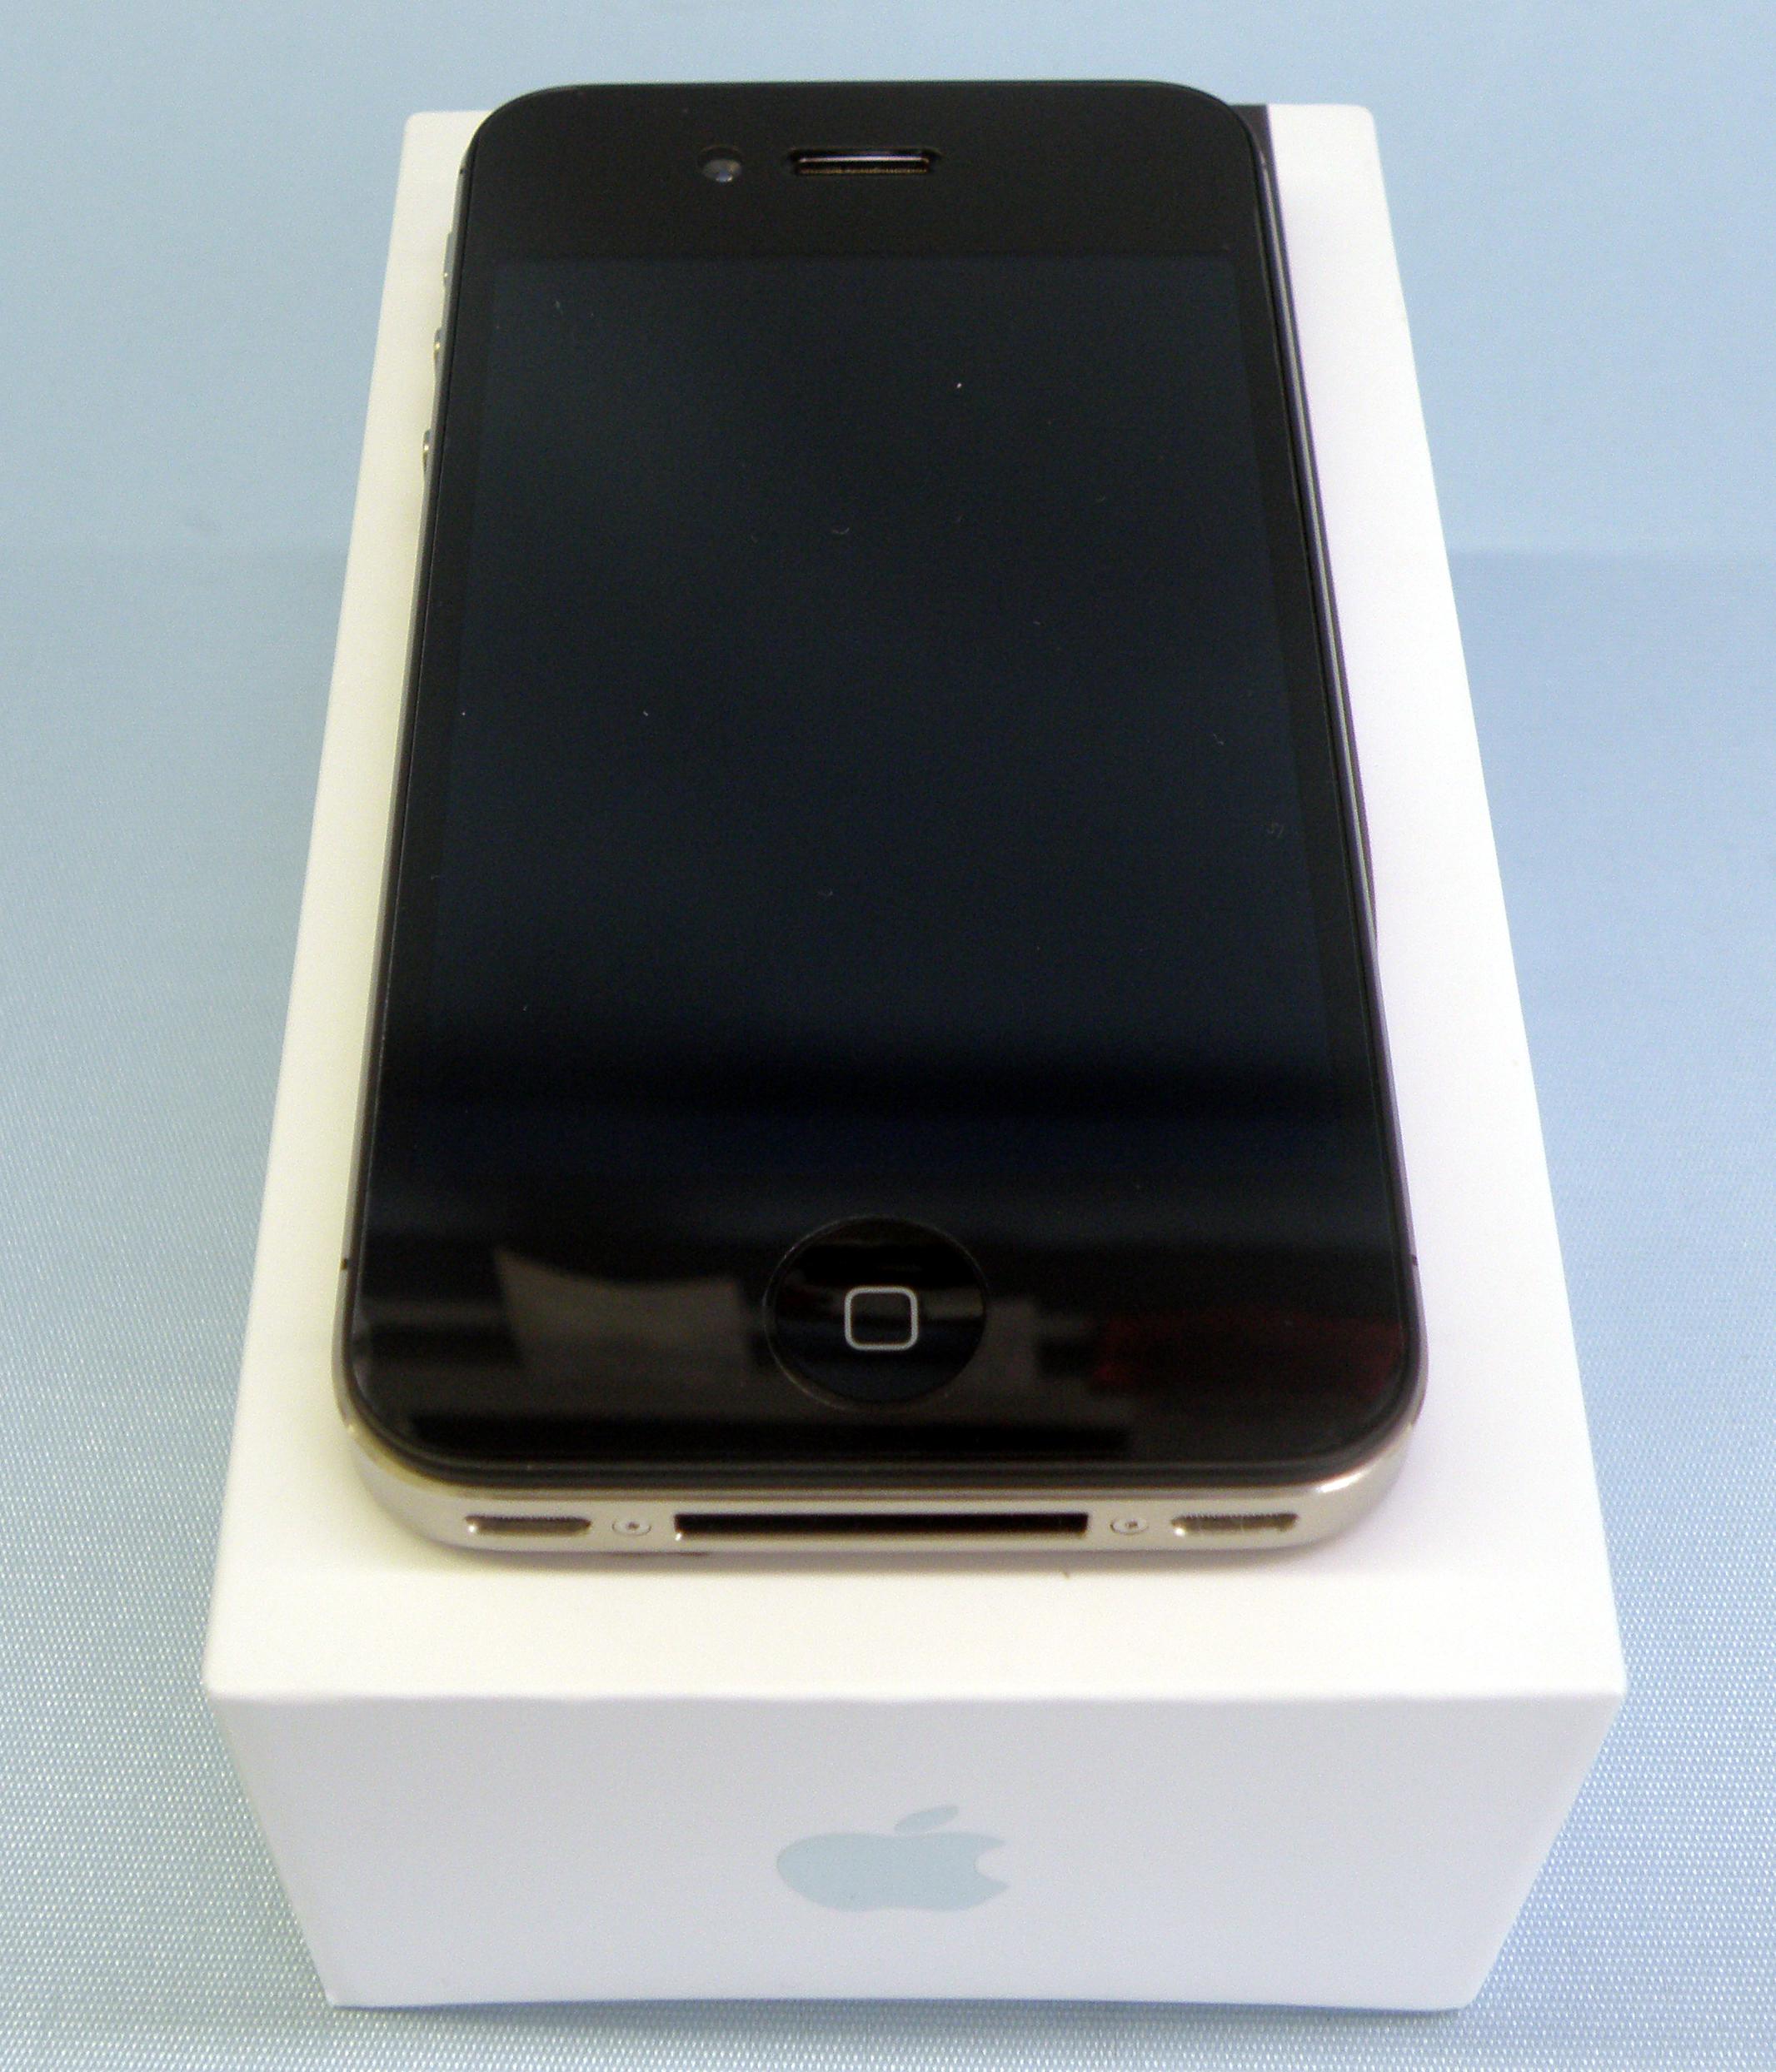 Apple iPhone4S 16GB MD235J/A